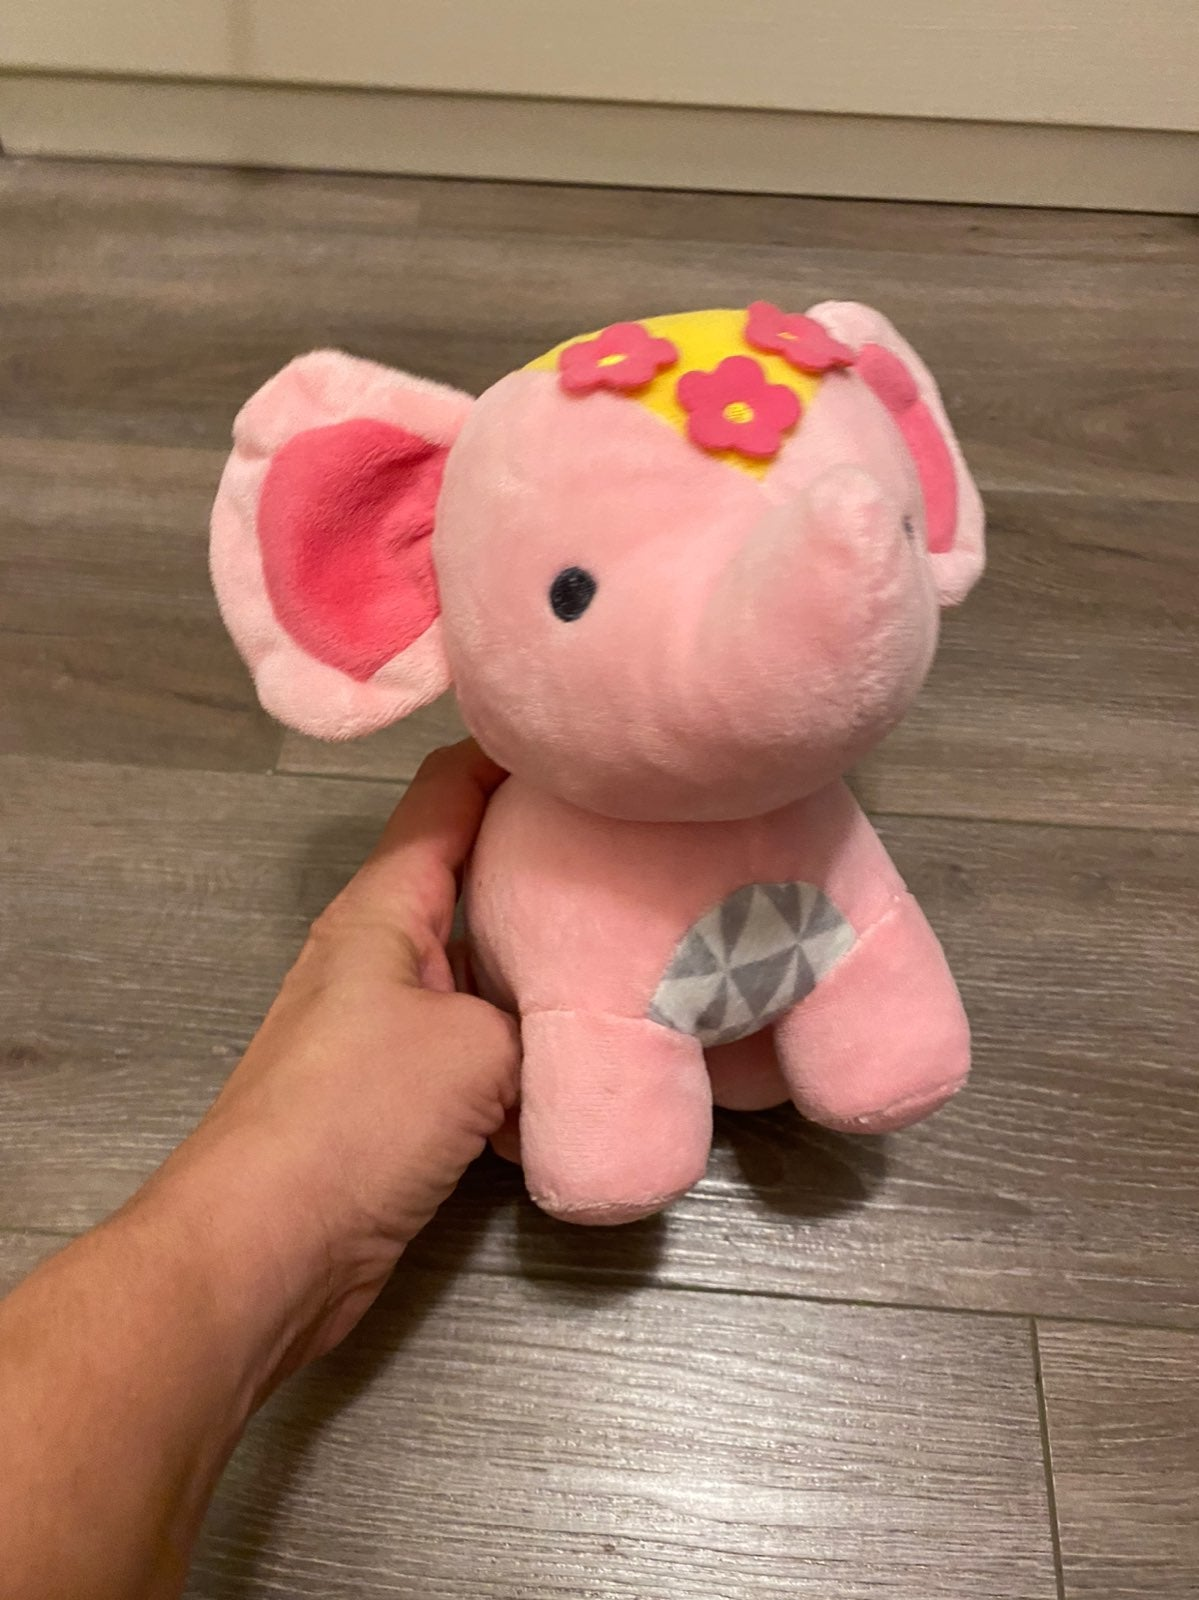 Disney Its a small world plush elephant